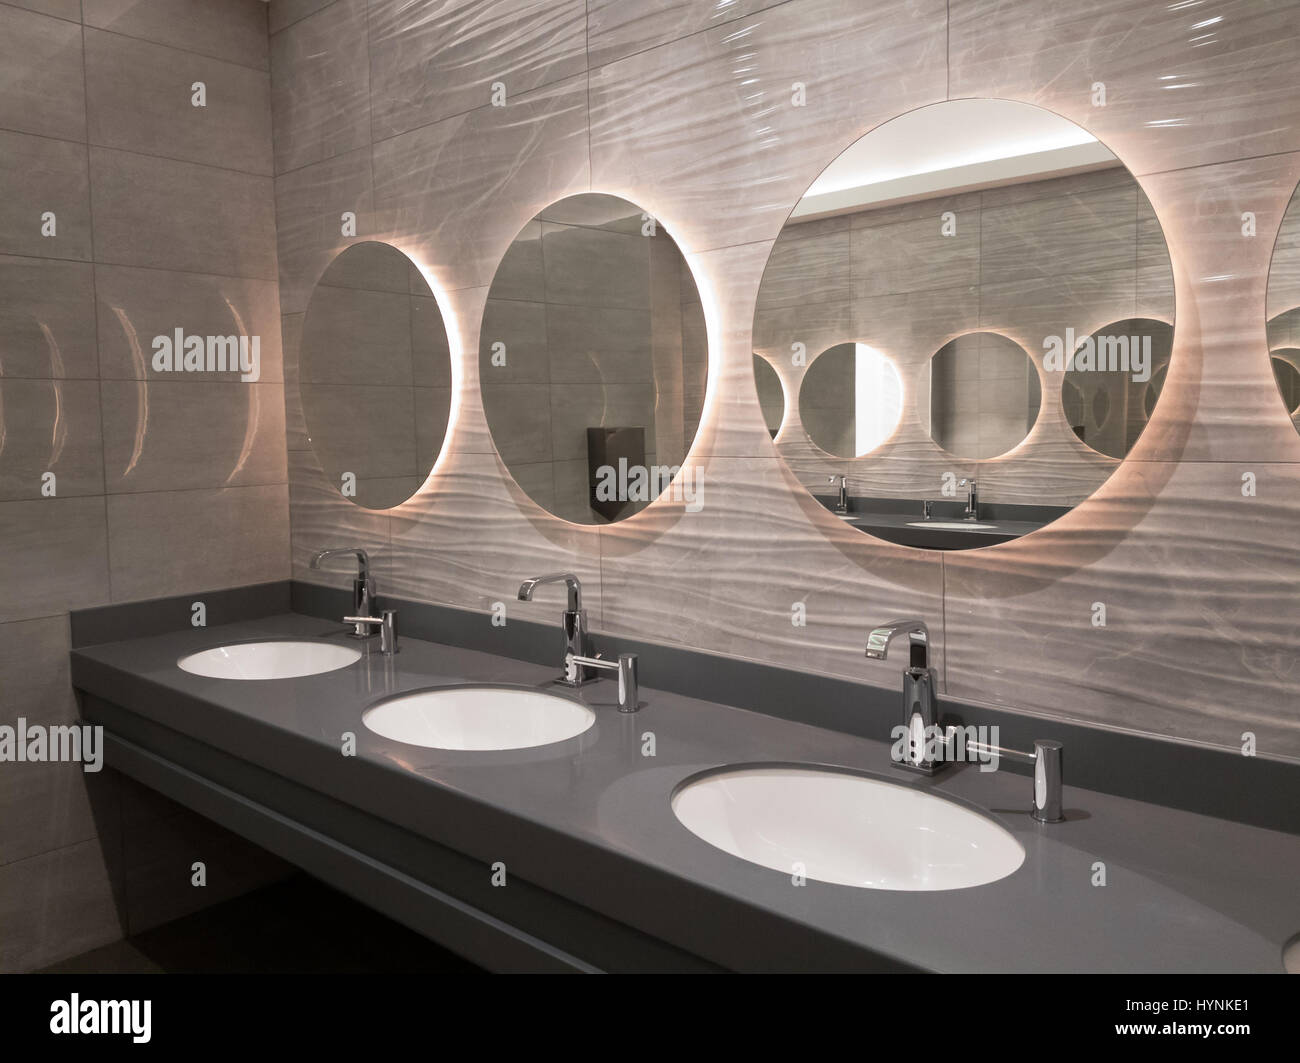 . Modern public washroom interior Stock Photo  137544569   Alamy